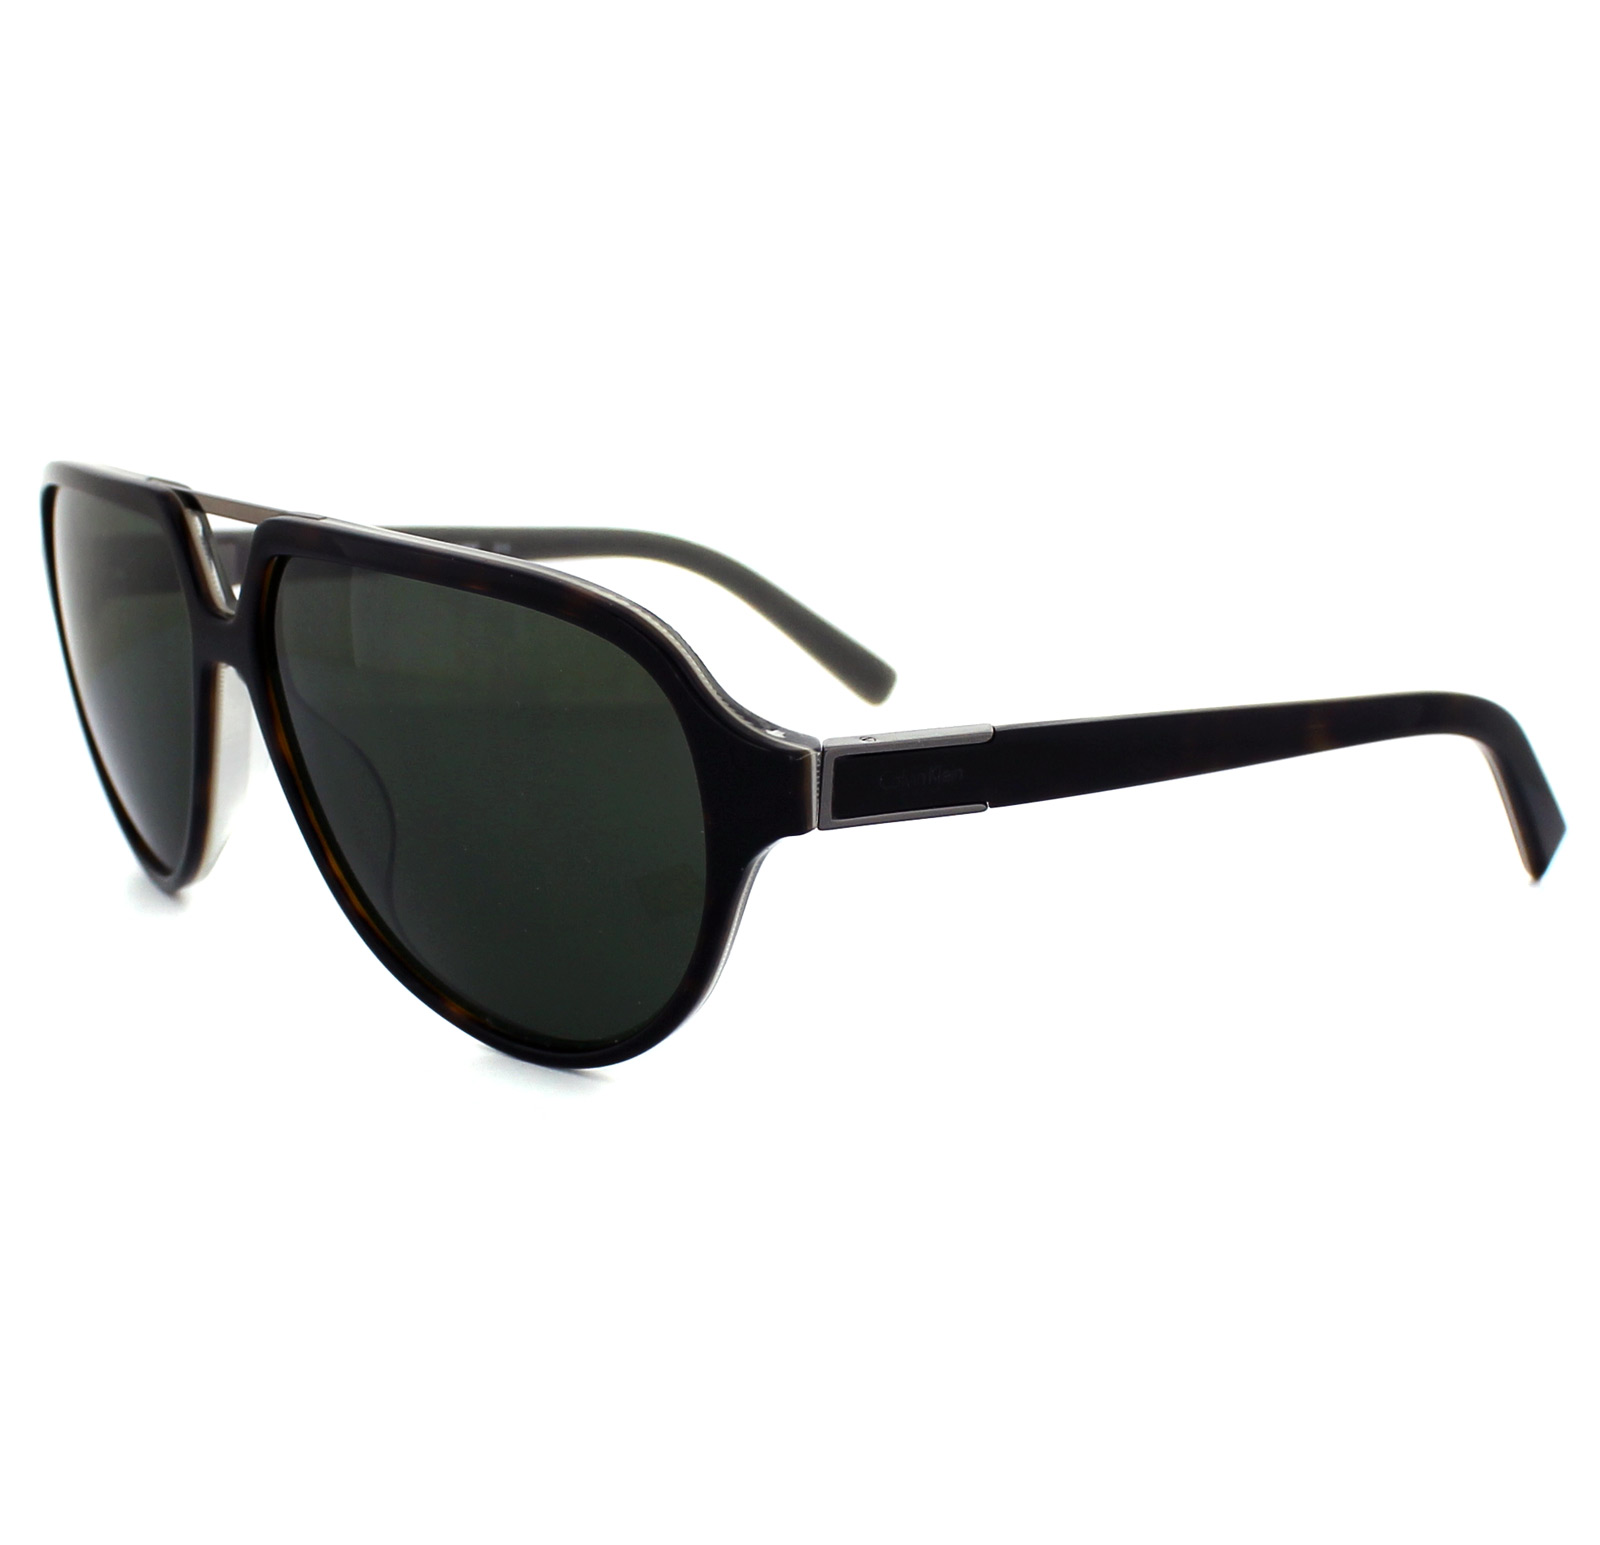 Calvin Klein Sunglasses 7858SP 214 Havana Grey Green Polarized 750779039465 | eBay